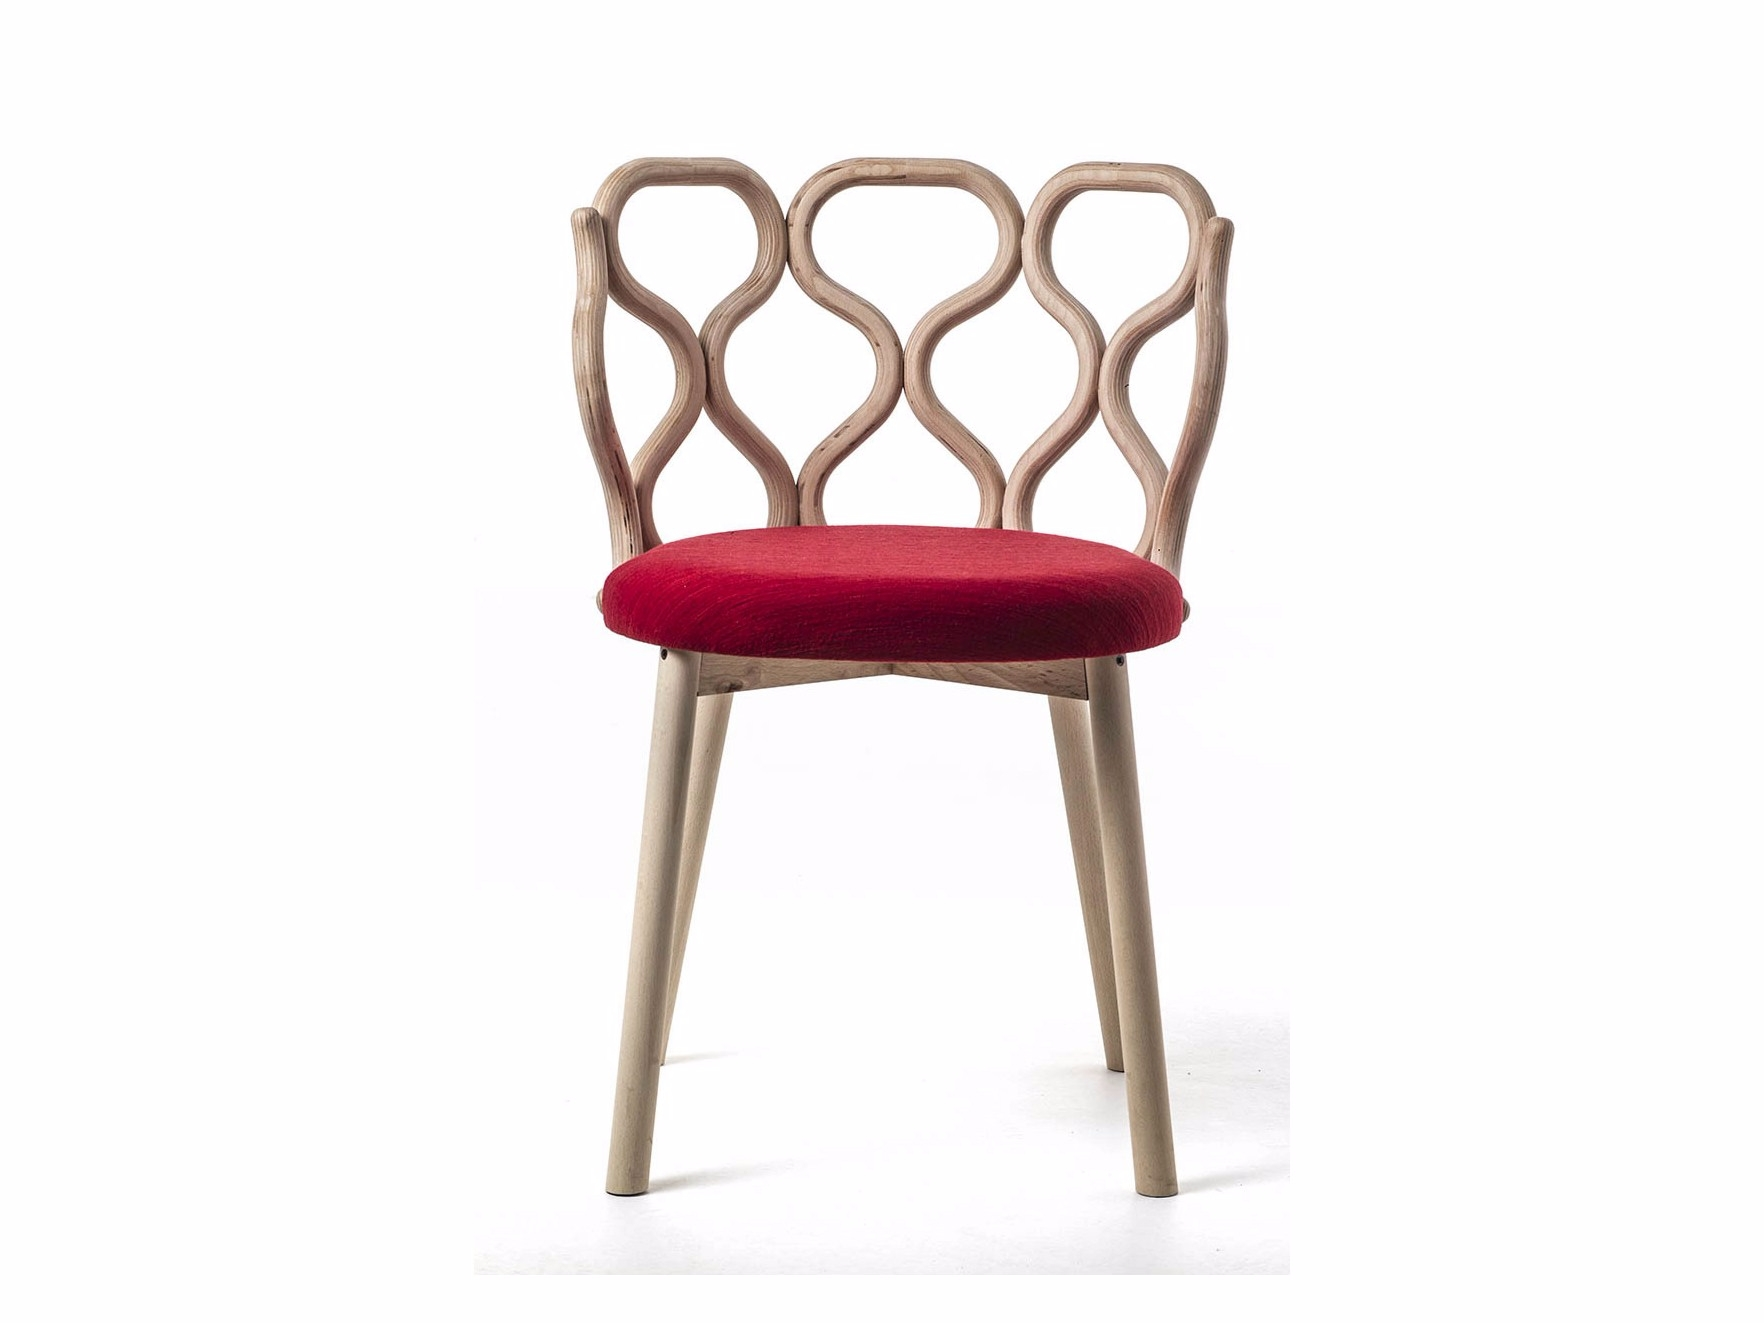 GERLA LucidiPevere furnitures - ellominimal5000 - thetreemag | ello